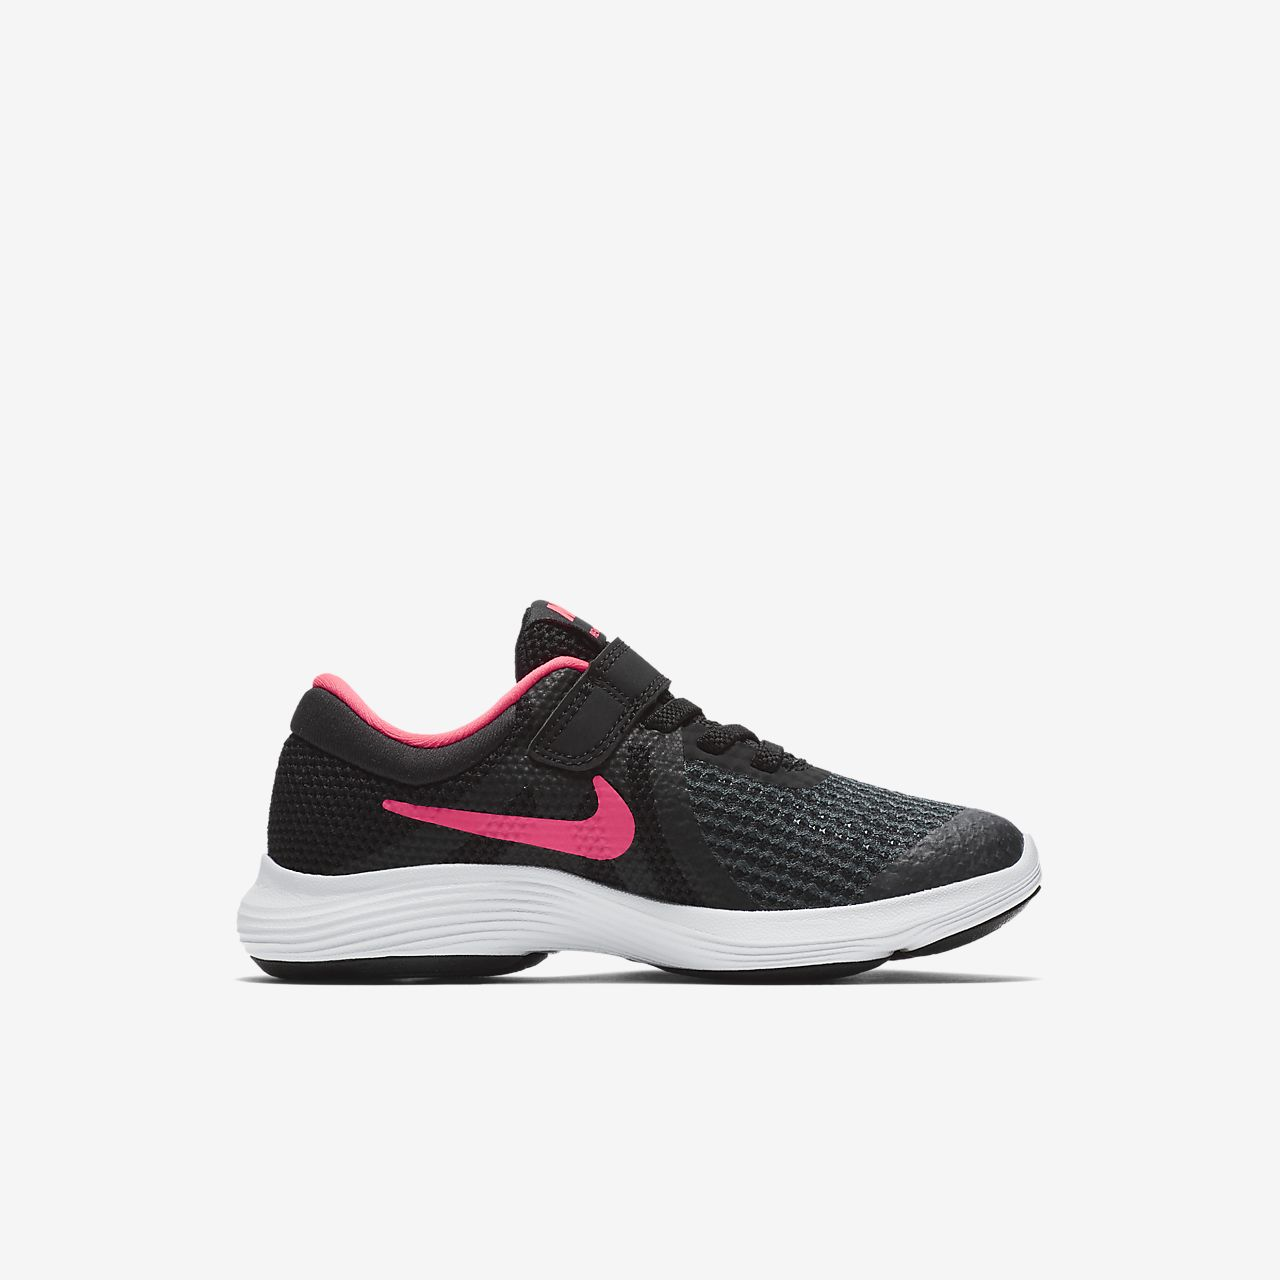 official photos 7f972 51d34 Nike Revolution 4